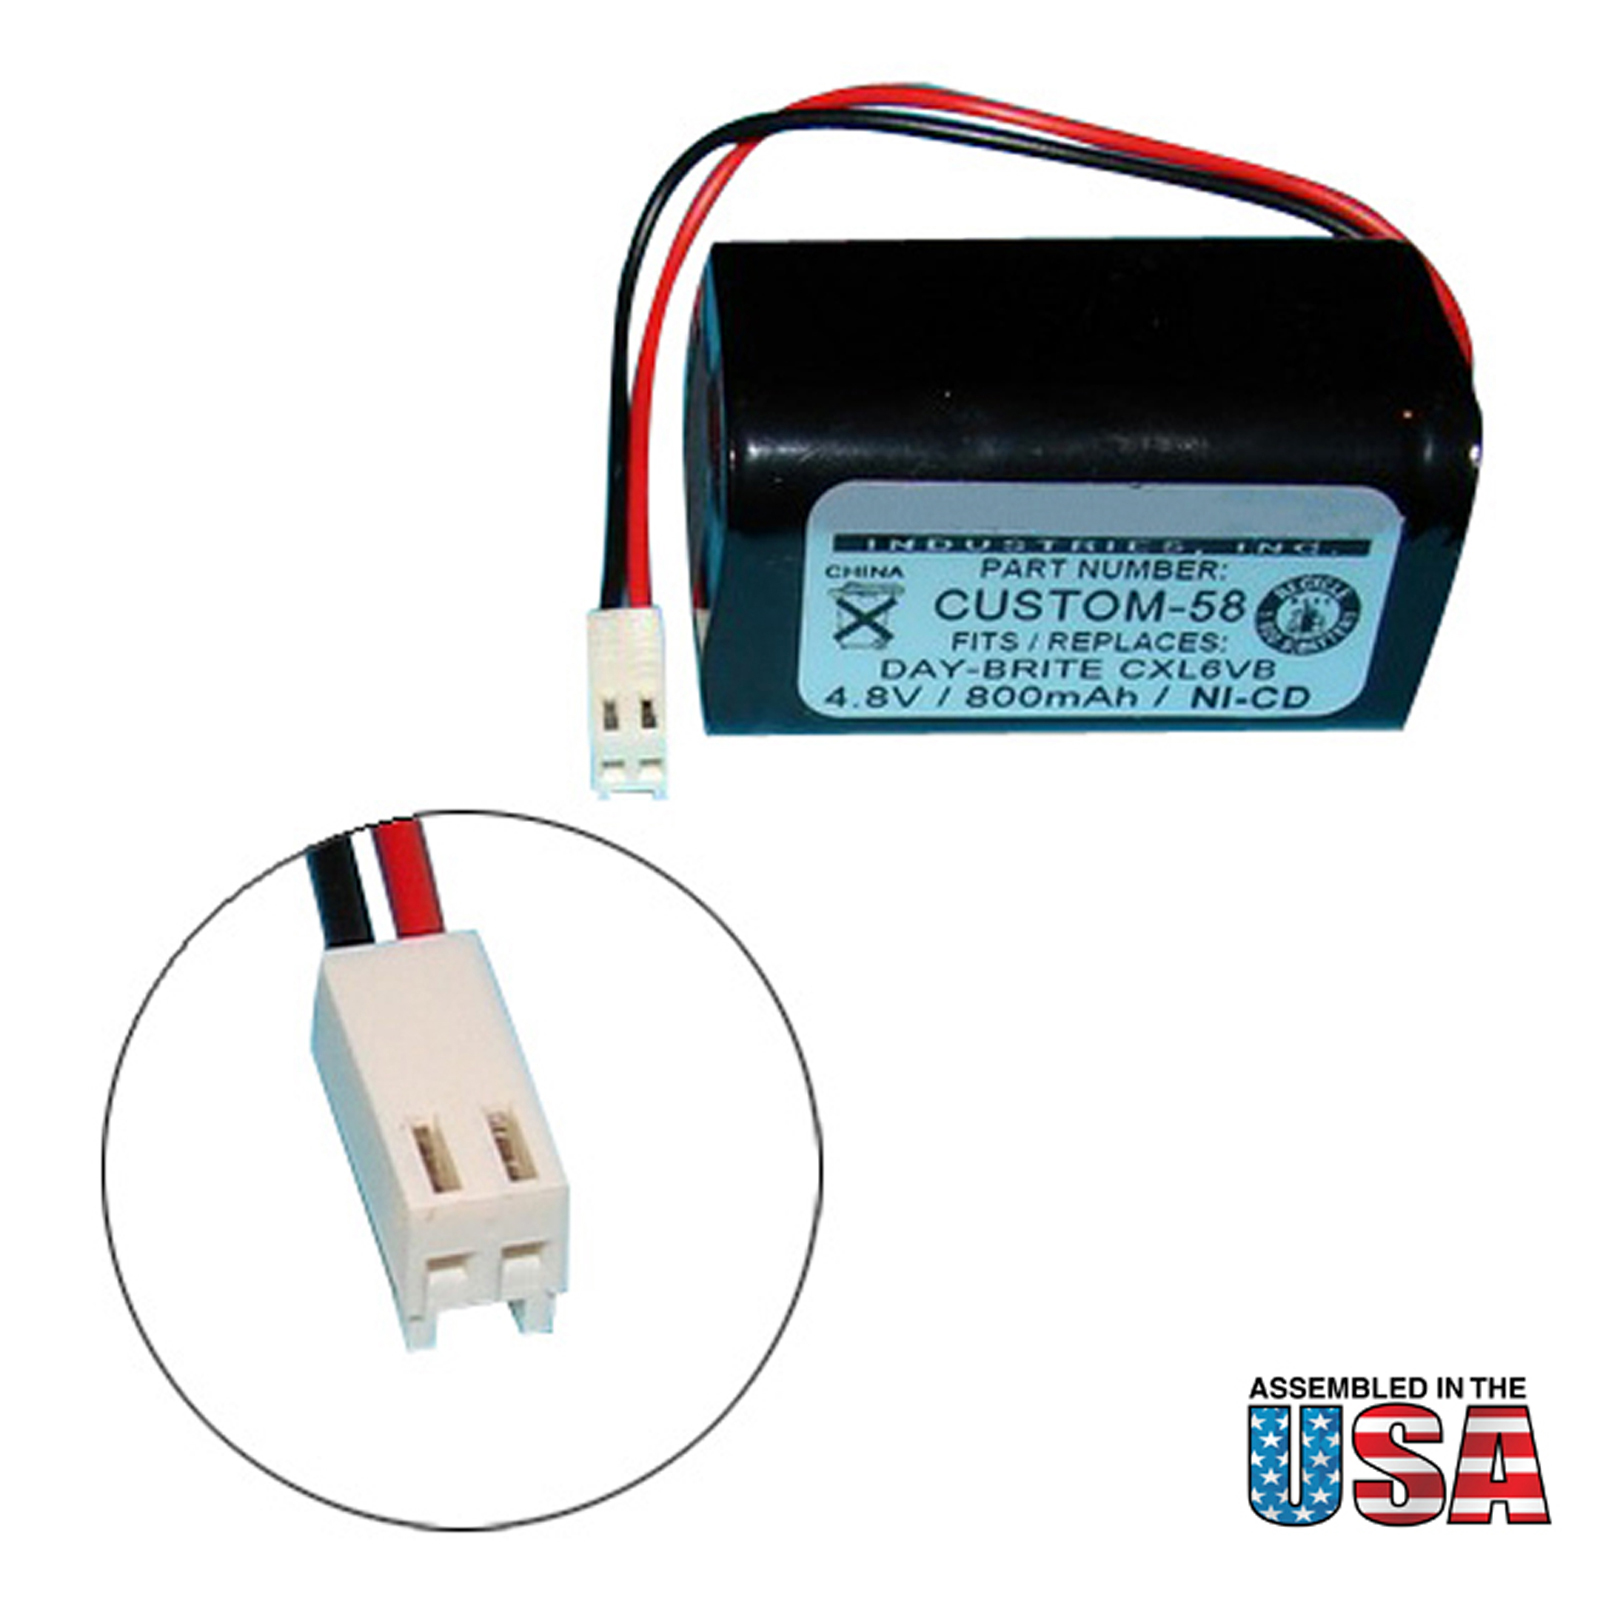 Emergency Lighting Battery Fits Day Brite Cxl6vb Ctl